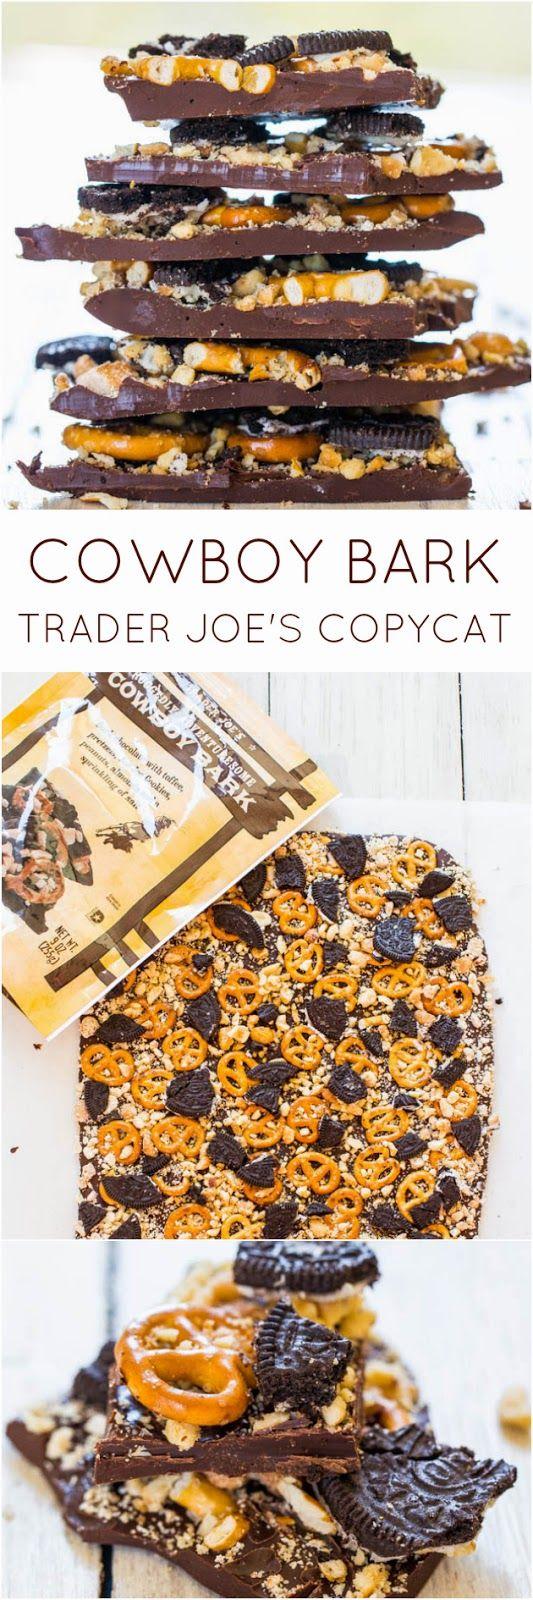 Cowboy Bark: Trader Joe's Copycat Recipe | Yummy !